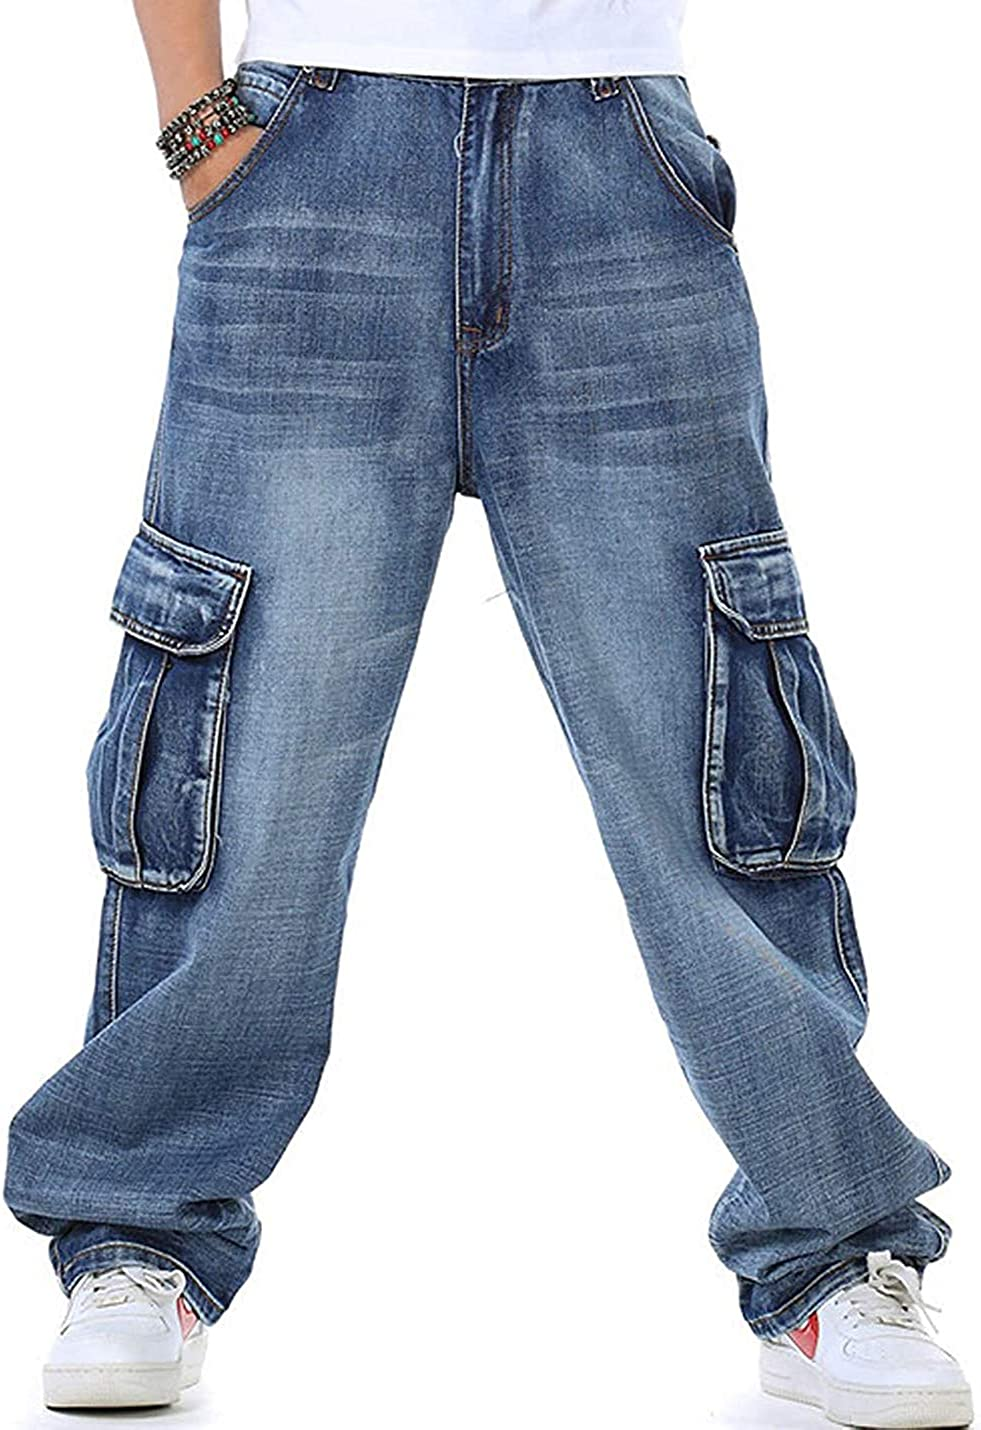 Daily bargain sale Ruiatoo Men's Outdoor Cargo Time sale Multi-Pocket Jeans Denim Work